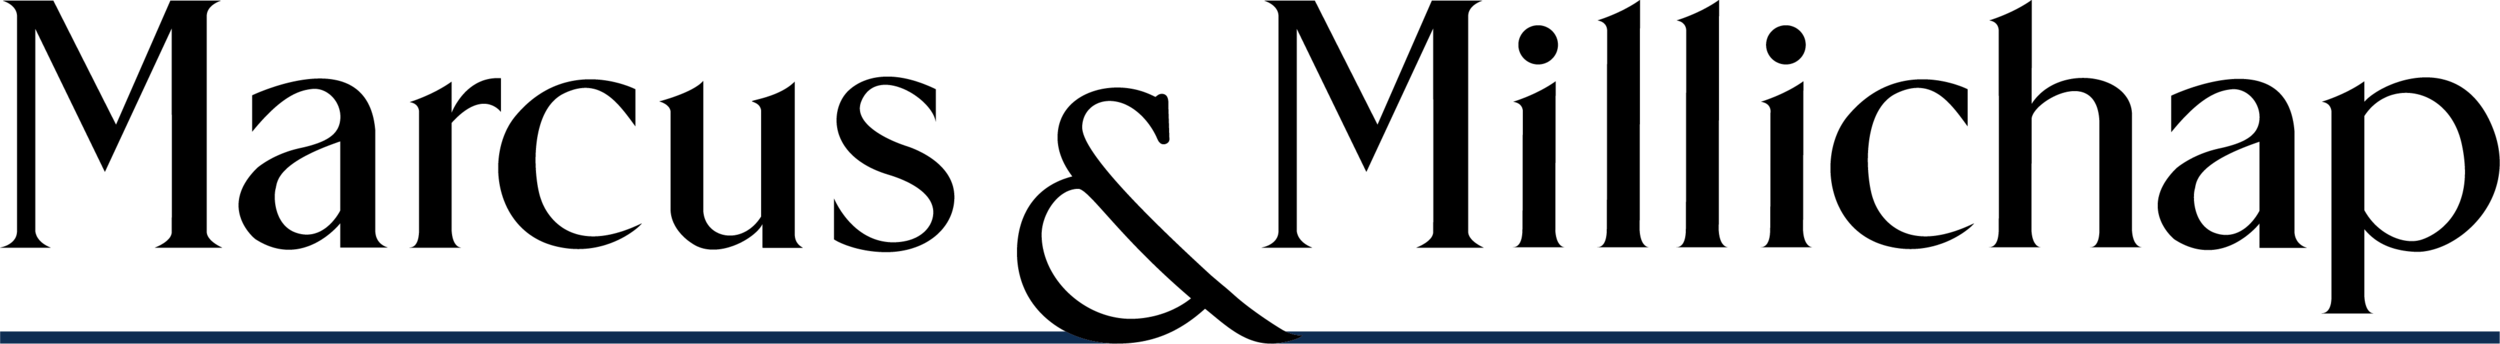 Blue M&M Logo High-Res Print (PNG).png